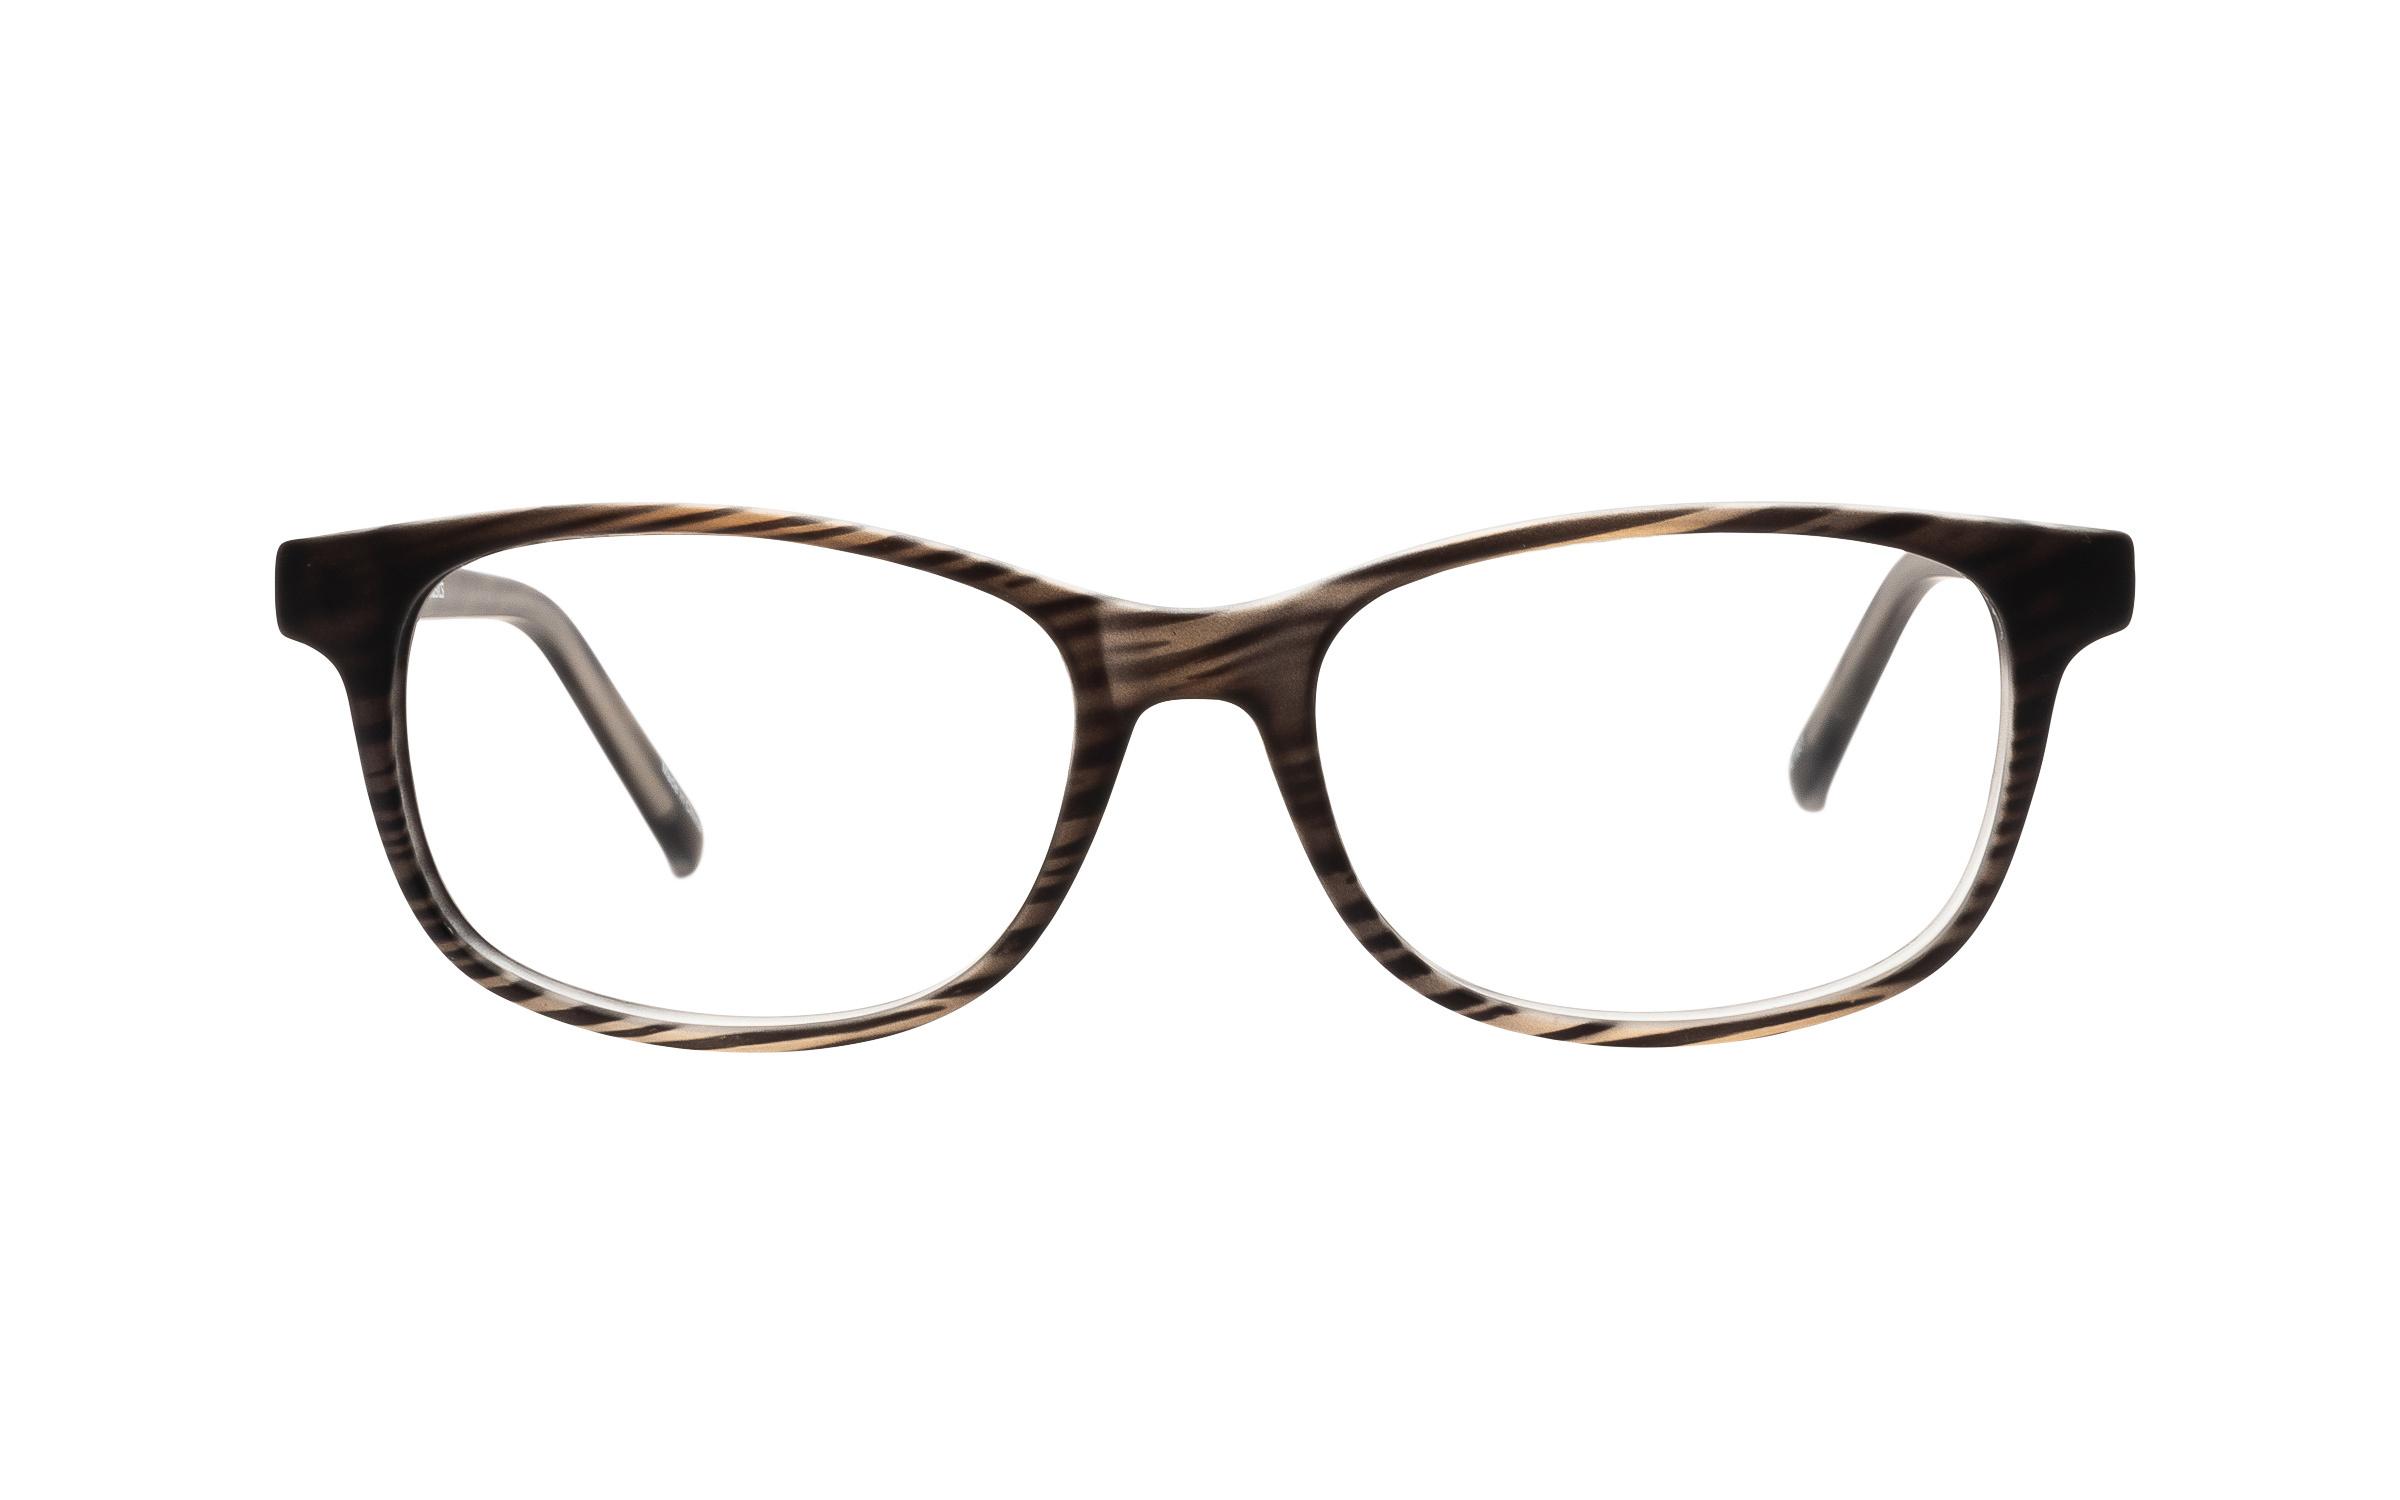 Clearly Basics Aroostook CLS013 C04 (52) Eyeglasses and Frame in Matt Horn Grey | Plastic - Online Coastal